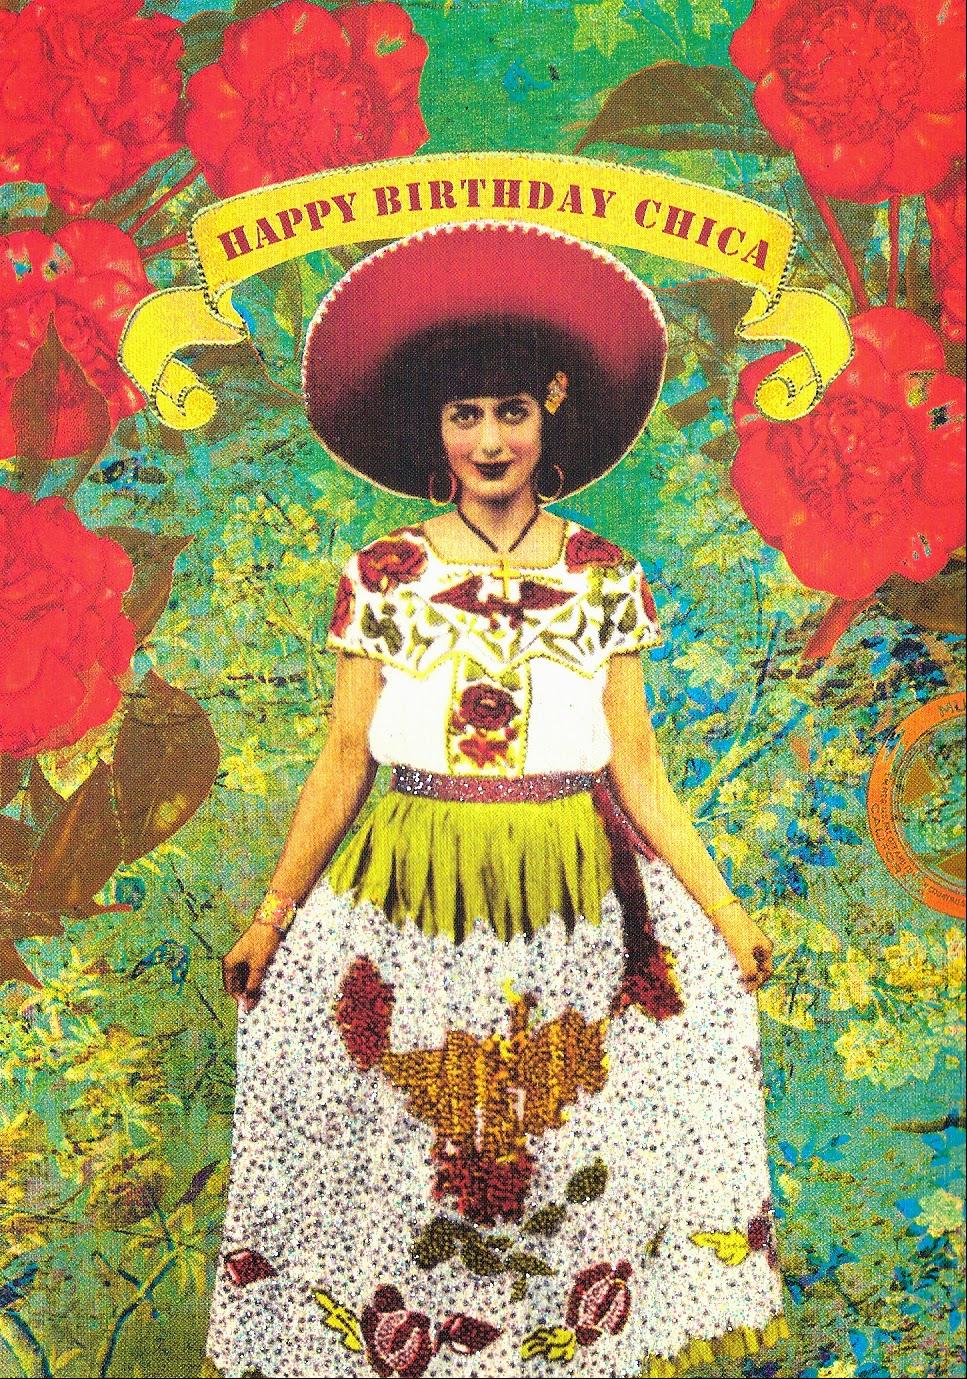 dolce vita postal service., Birthday card